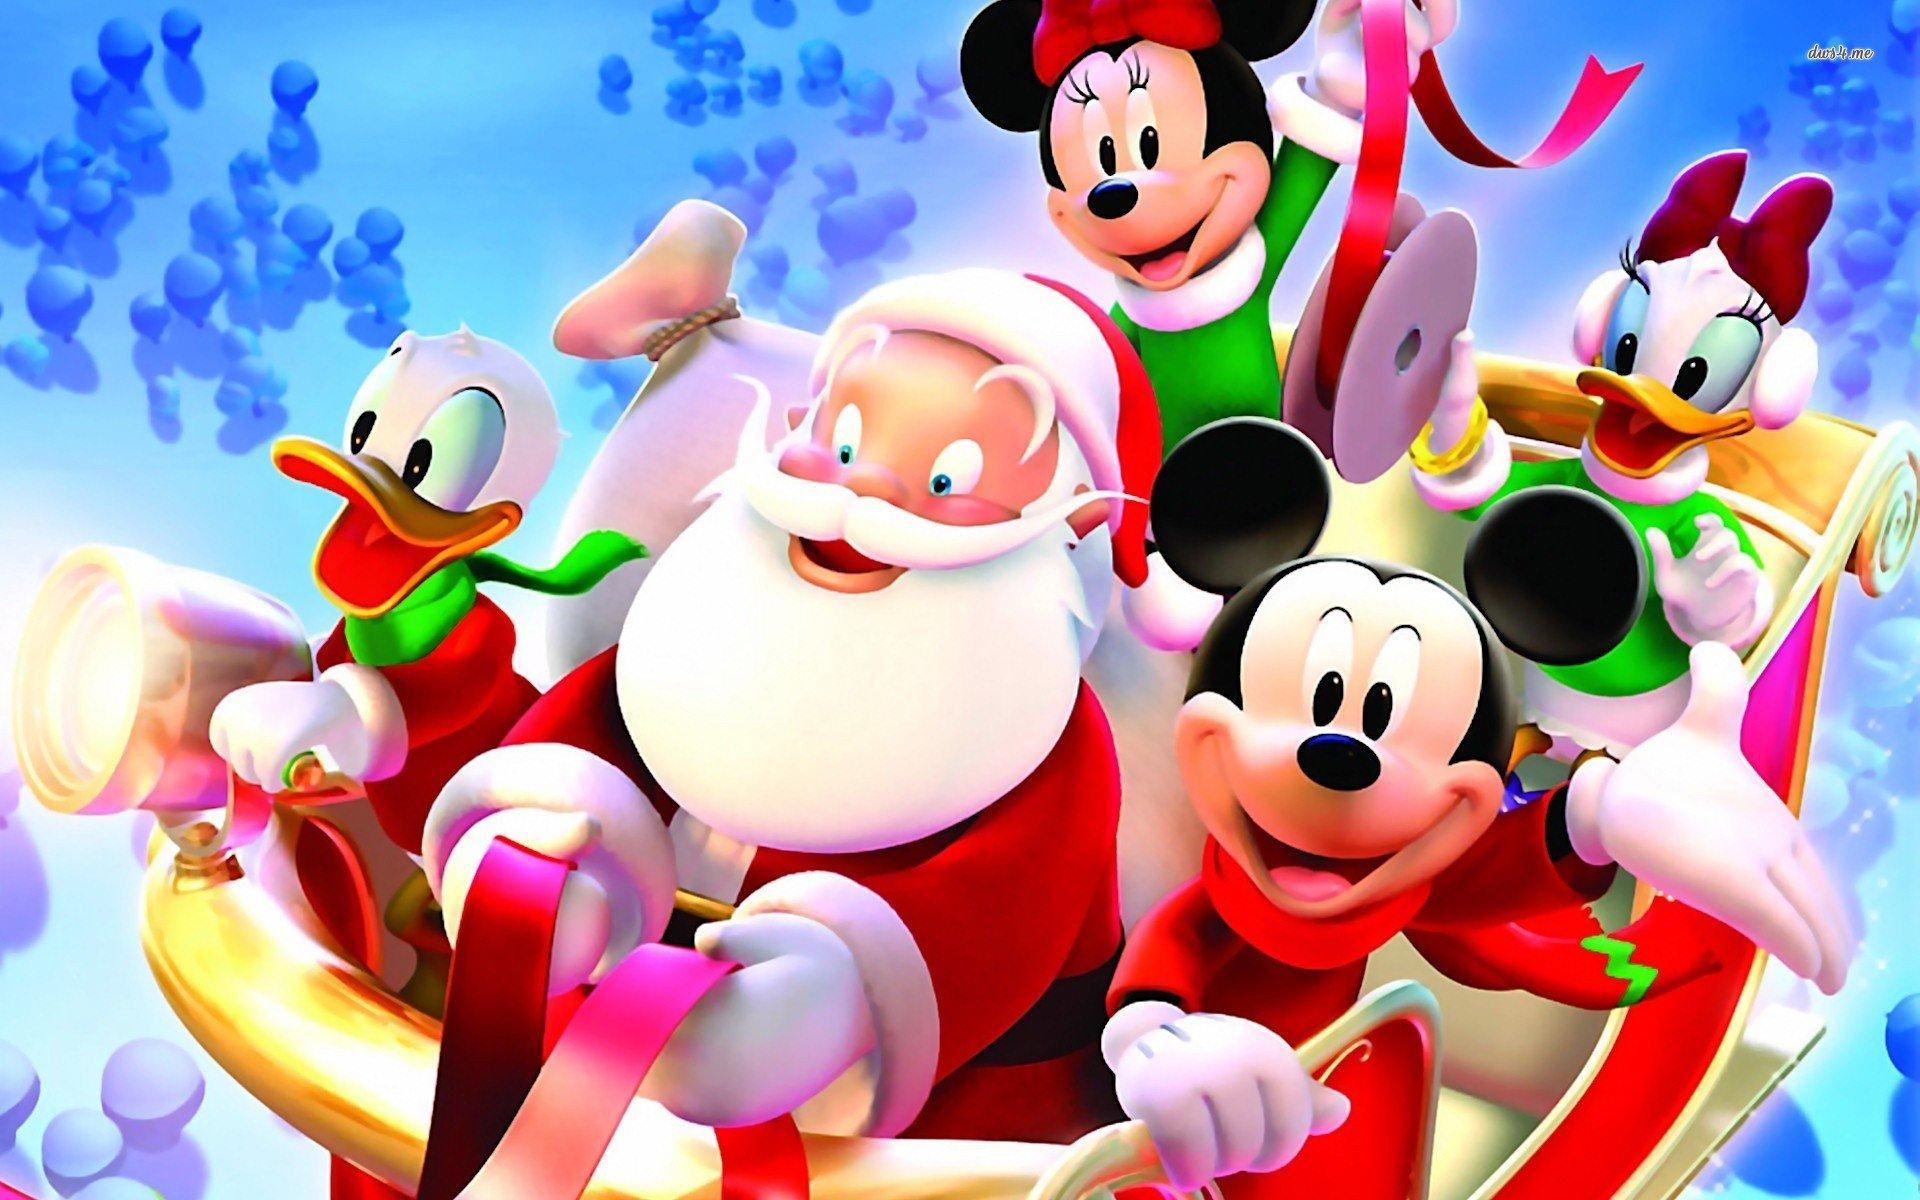 Disney Christmas Wallpapers HD 1920x1200